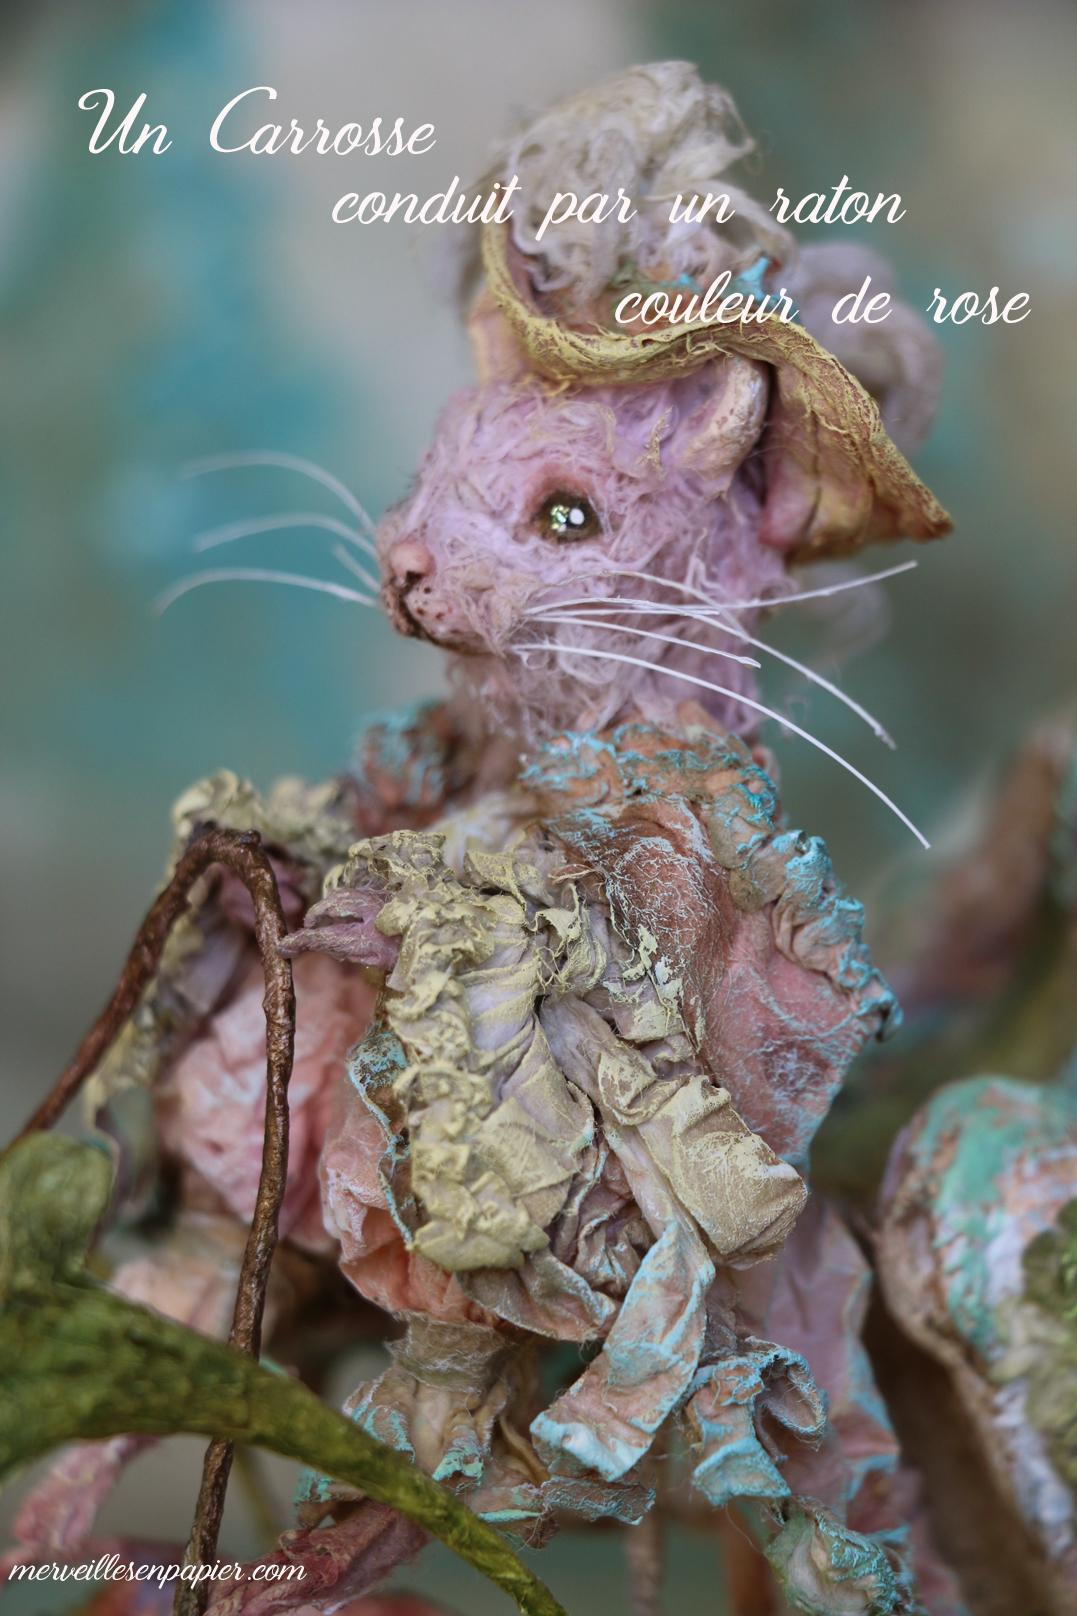 The pink rat driver - Blue Bird - Madame d'Aulnoy